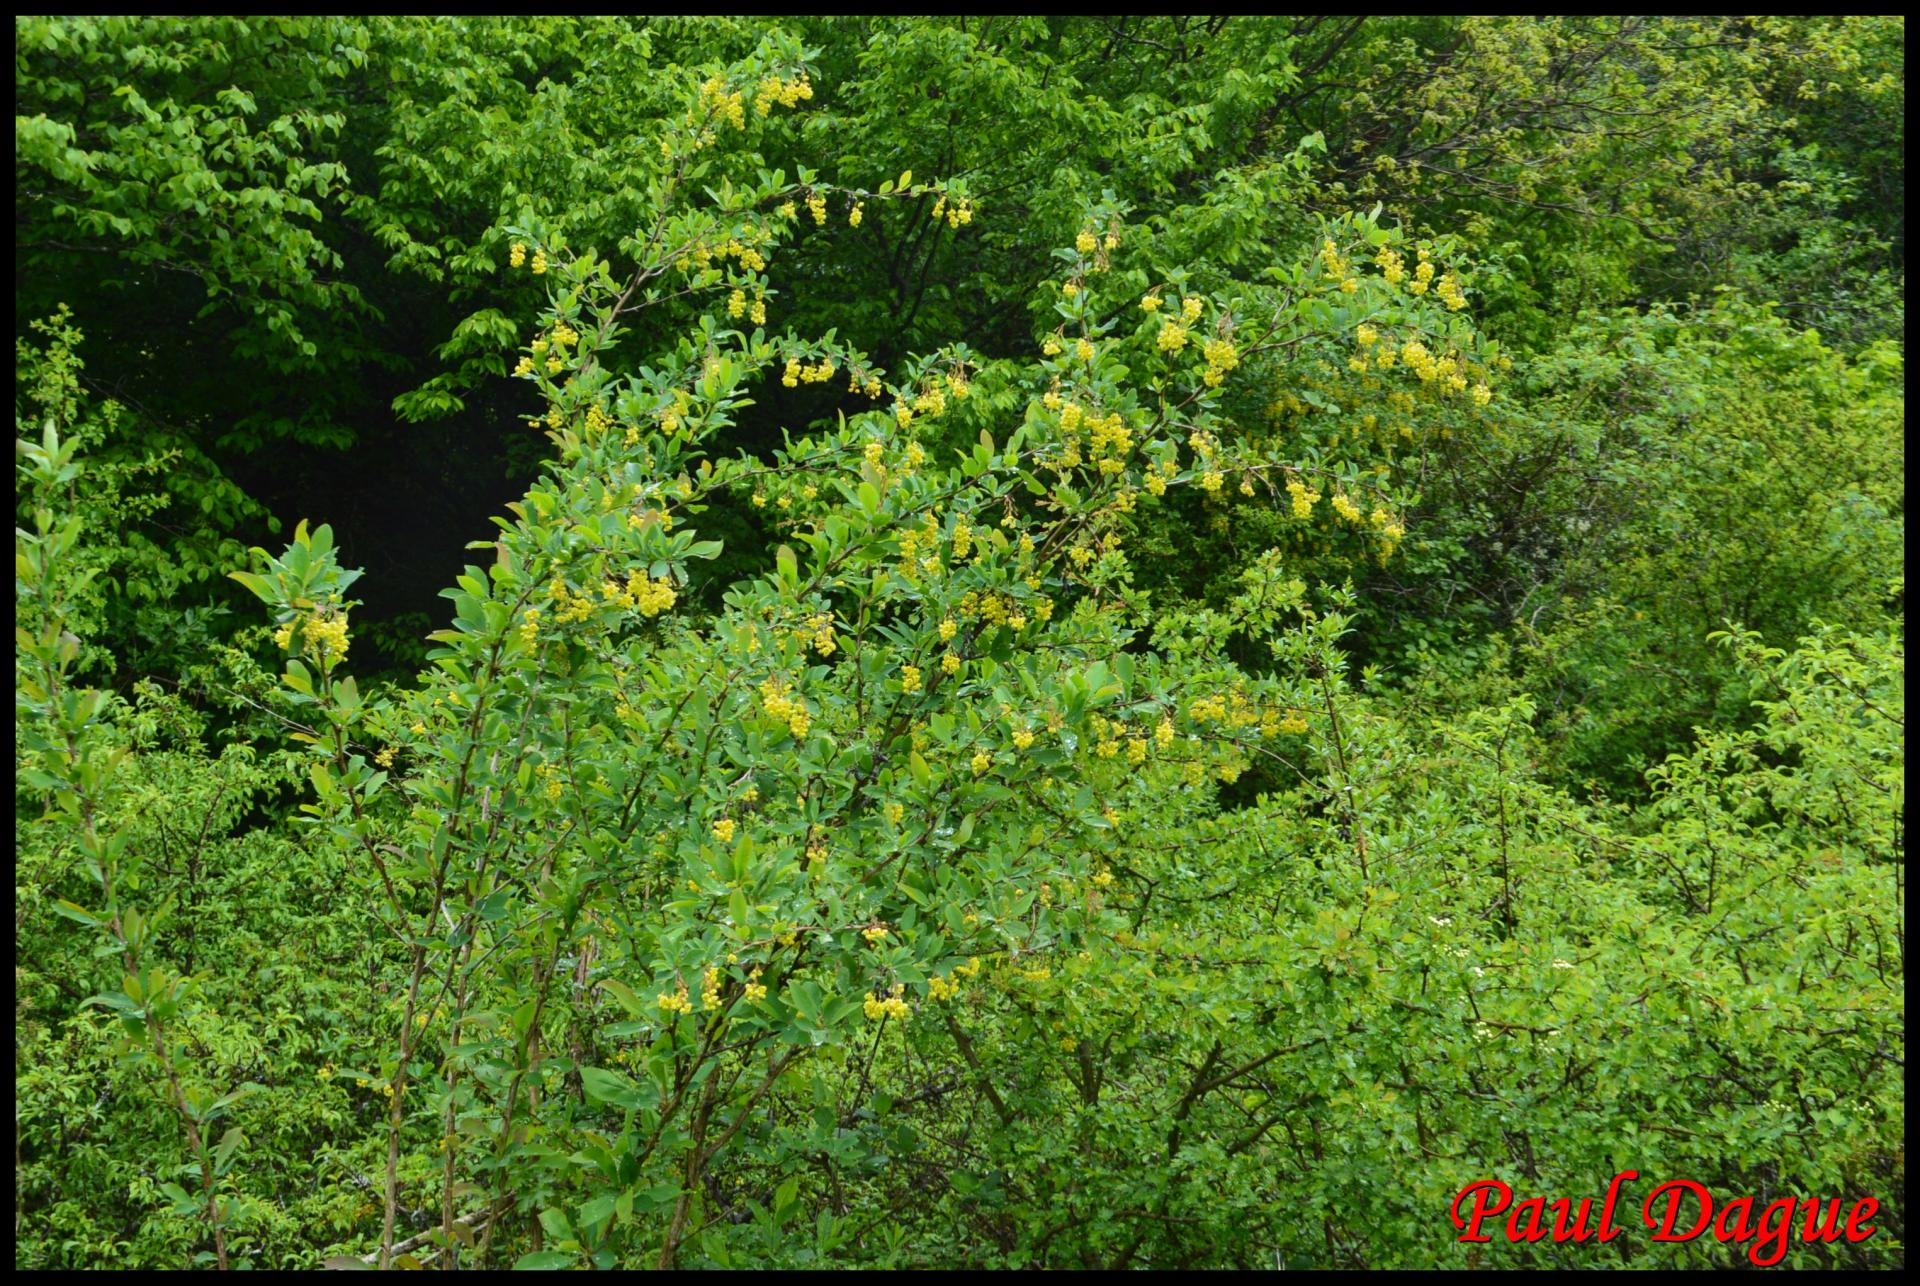 349 epine vinette berberis vulgaris berberidaceae resultat